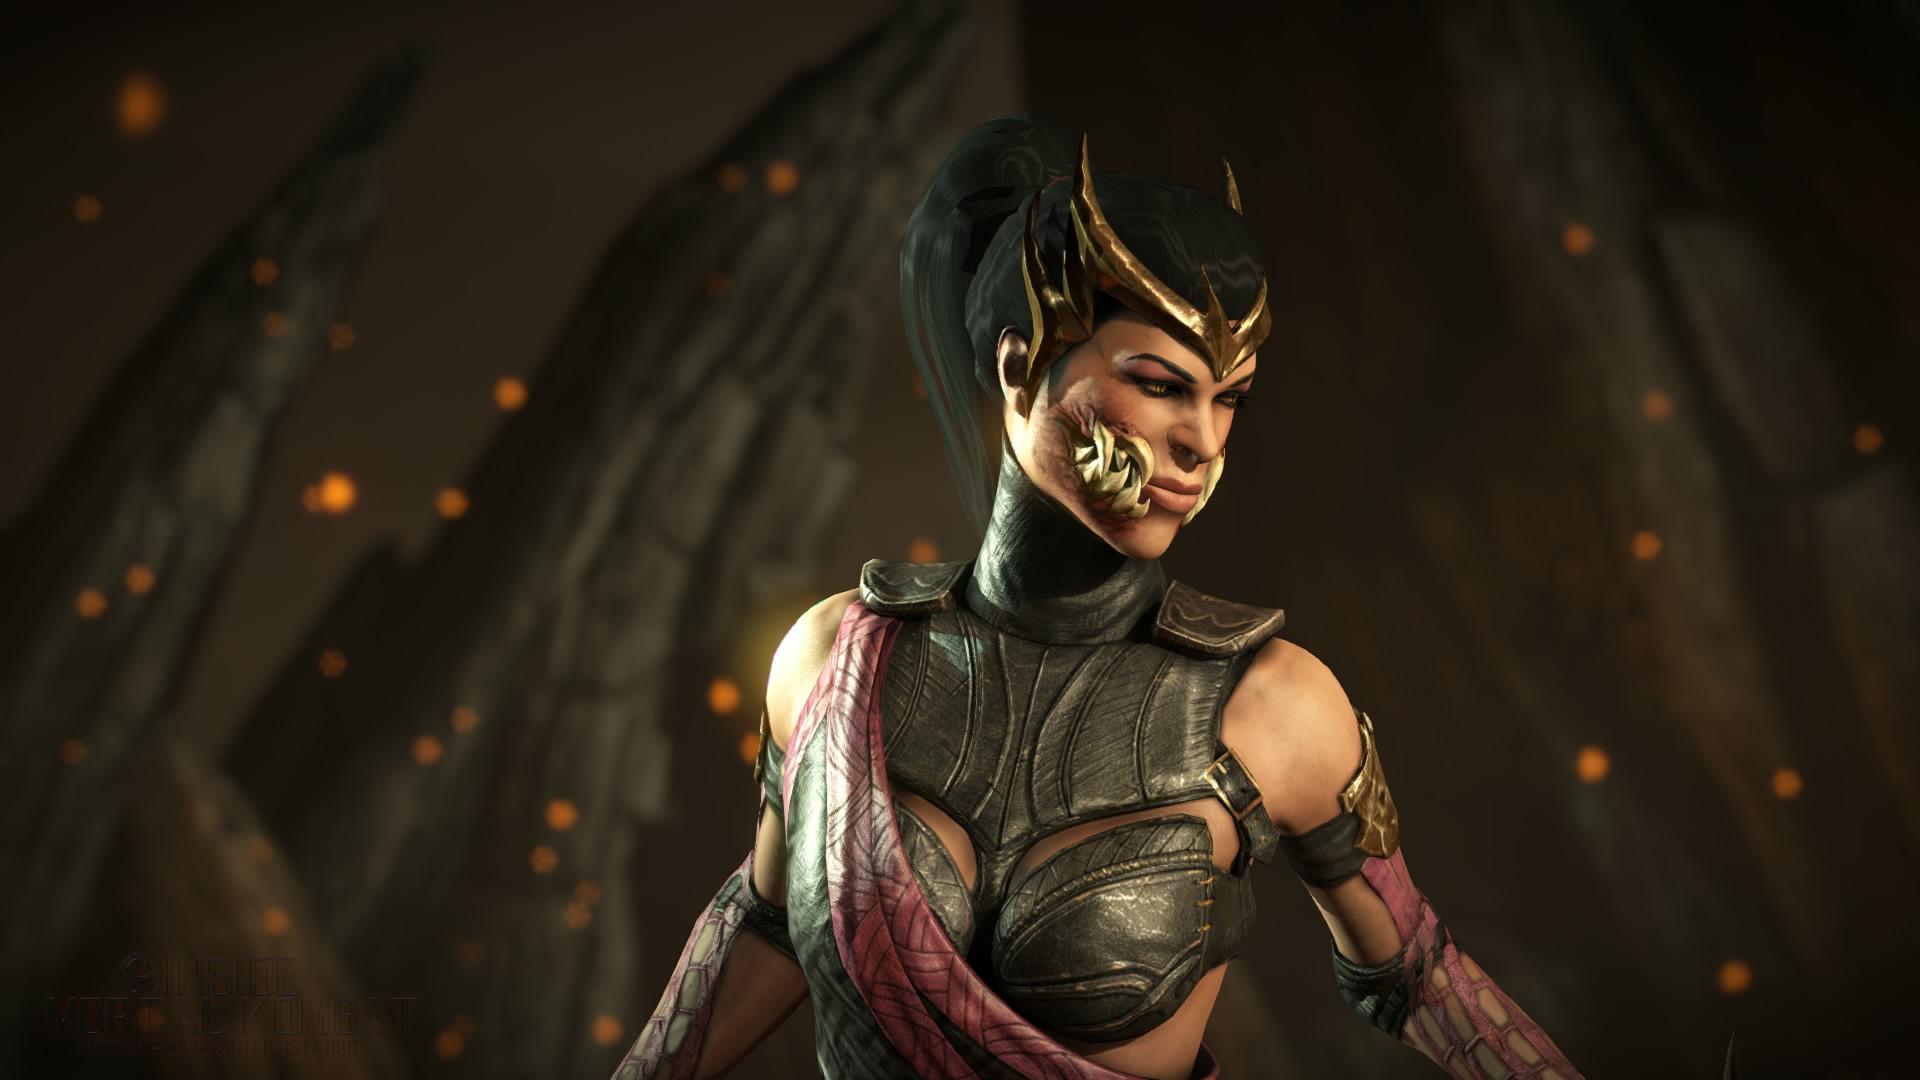 MKX] Mortal Kombat X Costume Render HD – Kitana Klassic, Mileena .